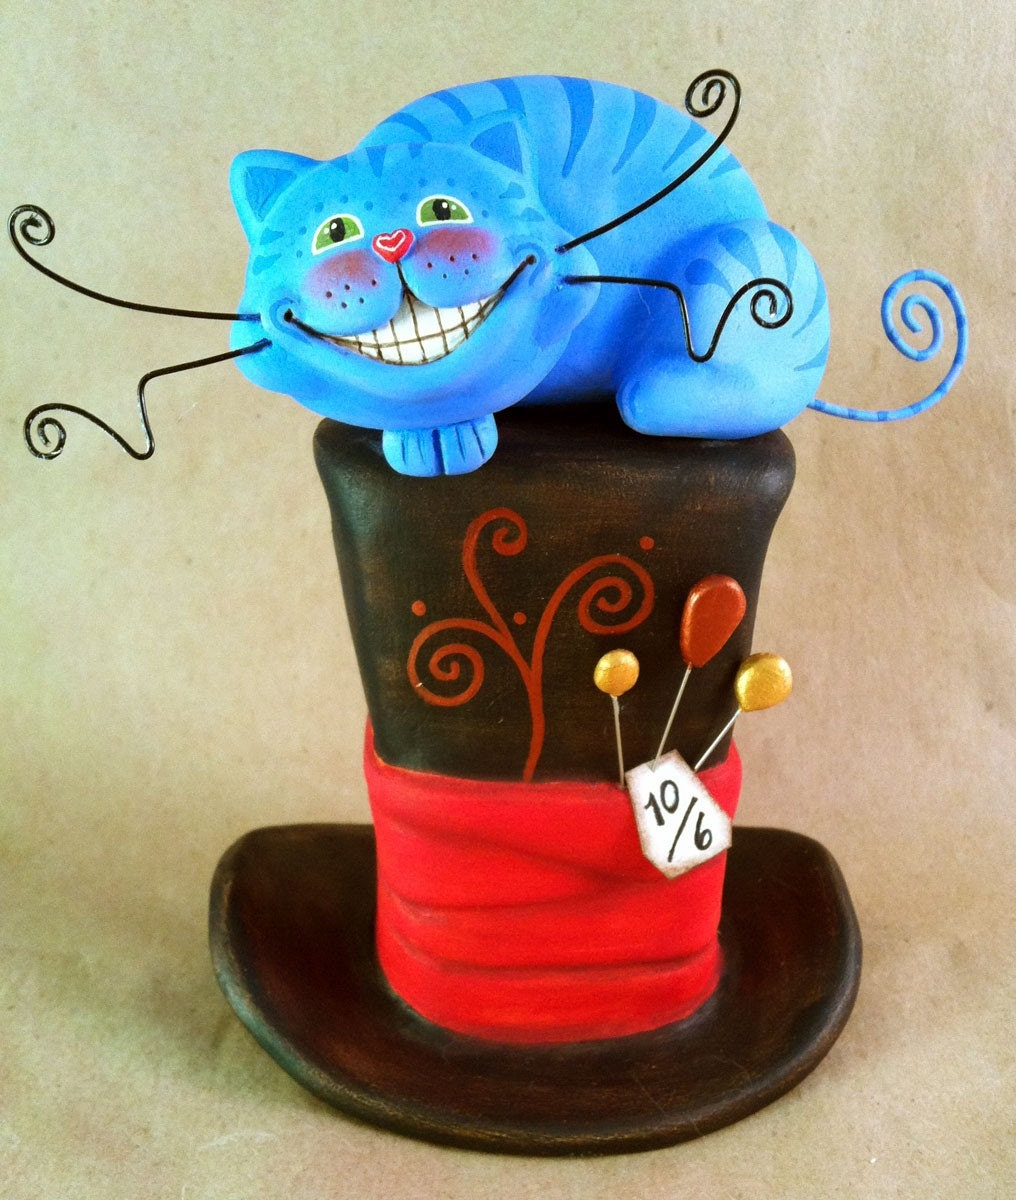 Cat In The Hat Cake Pan Wilton